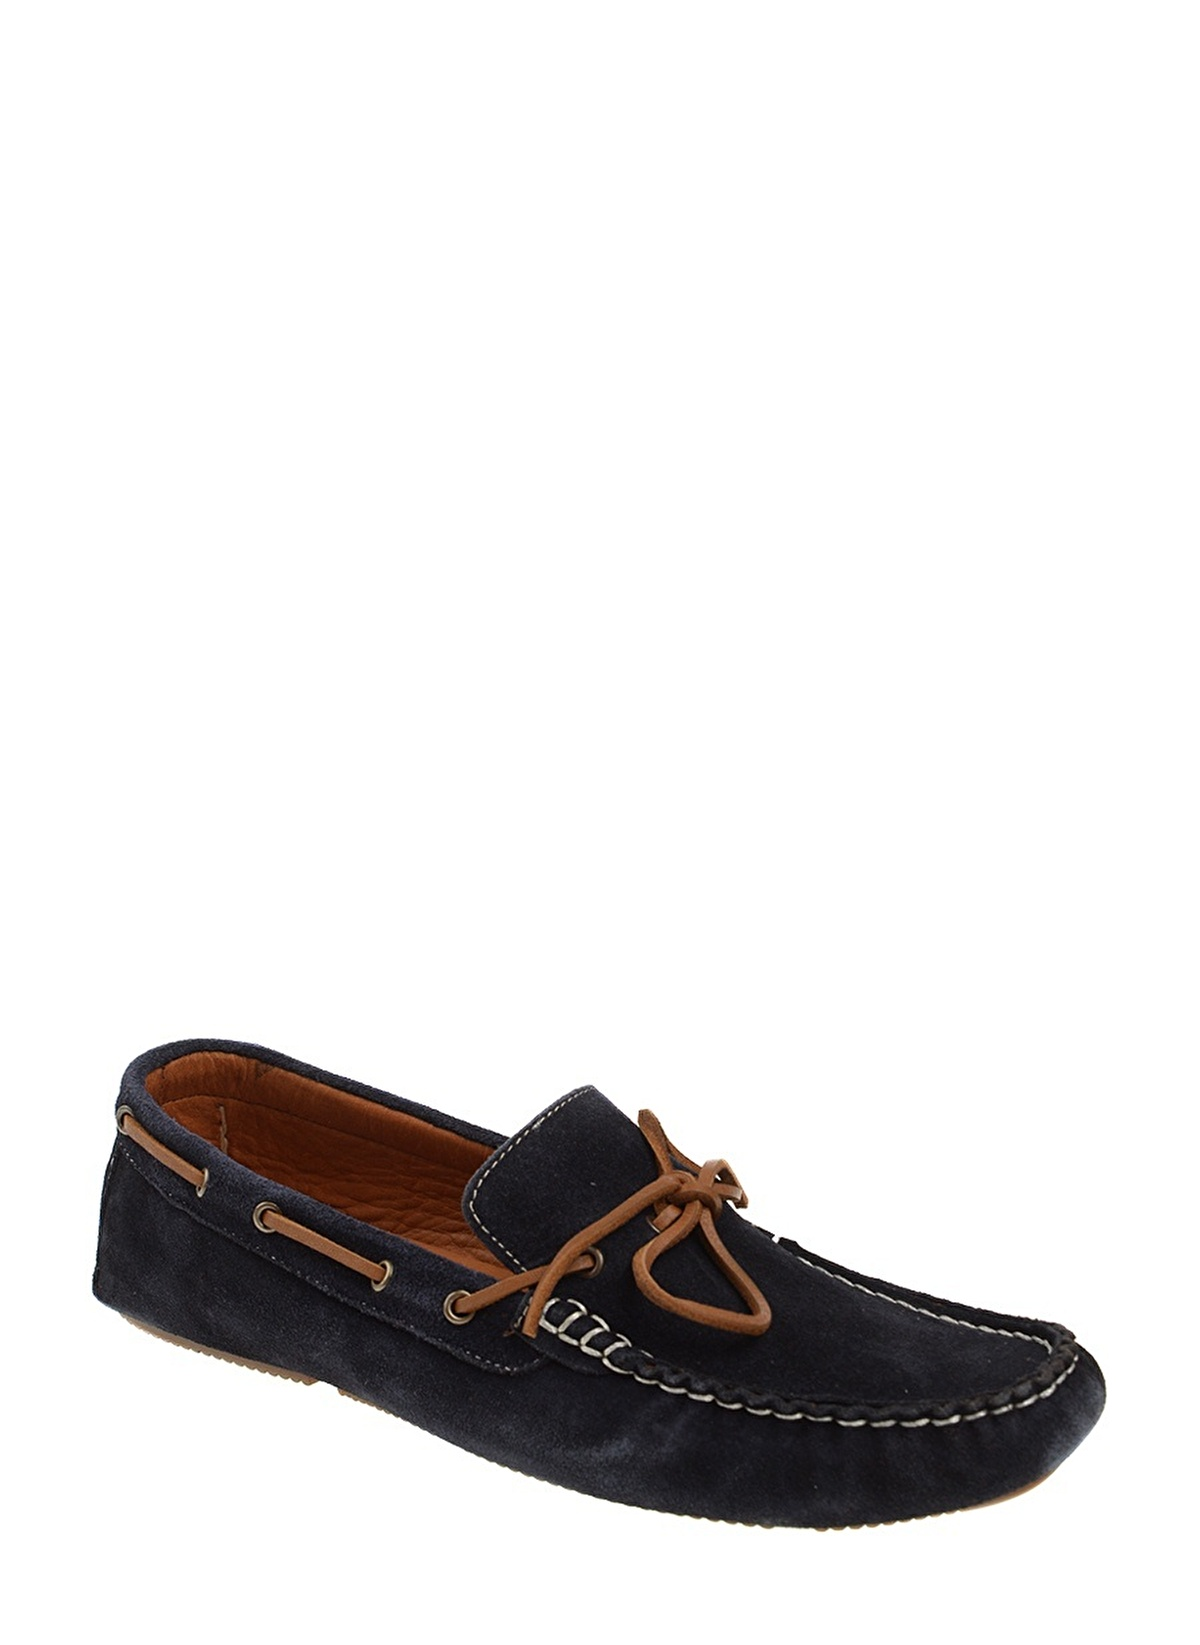 Divarese Ayakkabı 5014926 E Loafer – 139.0 TL